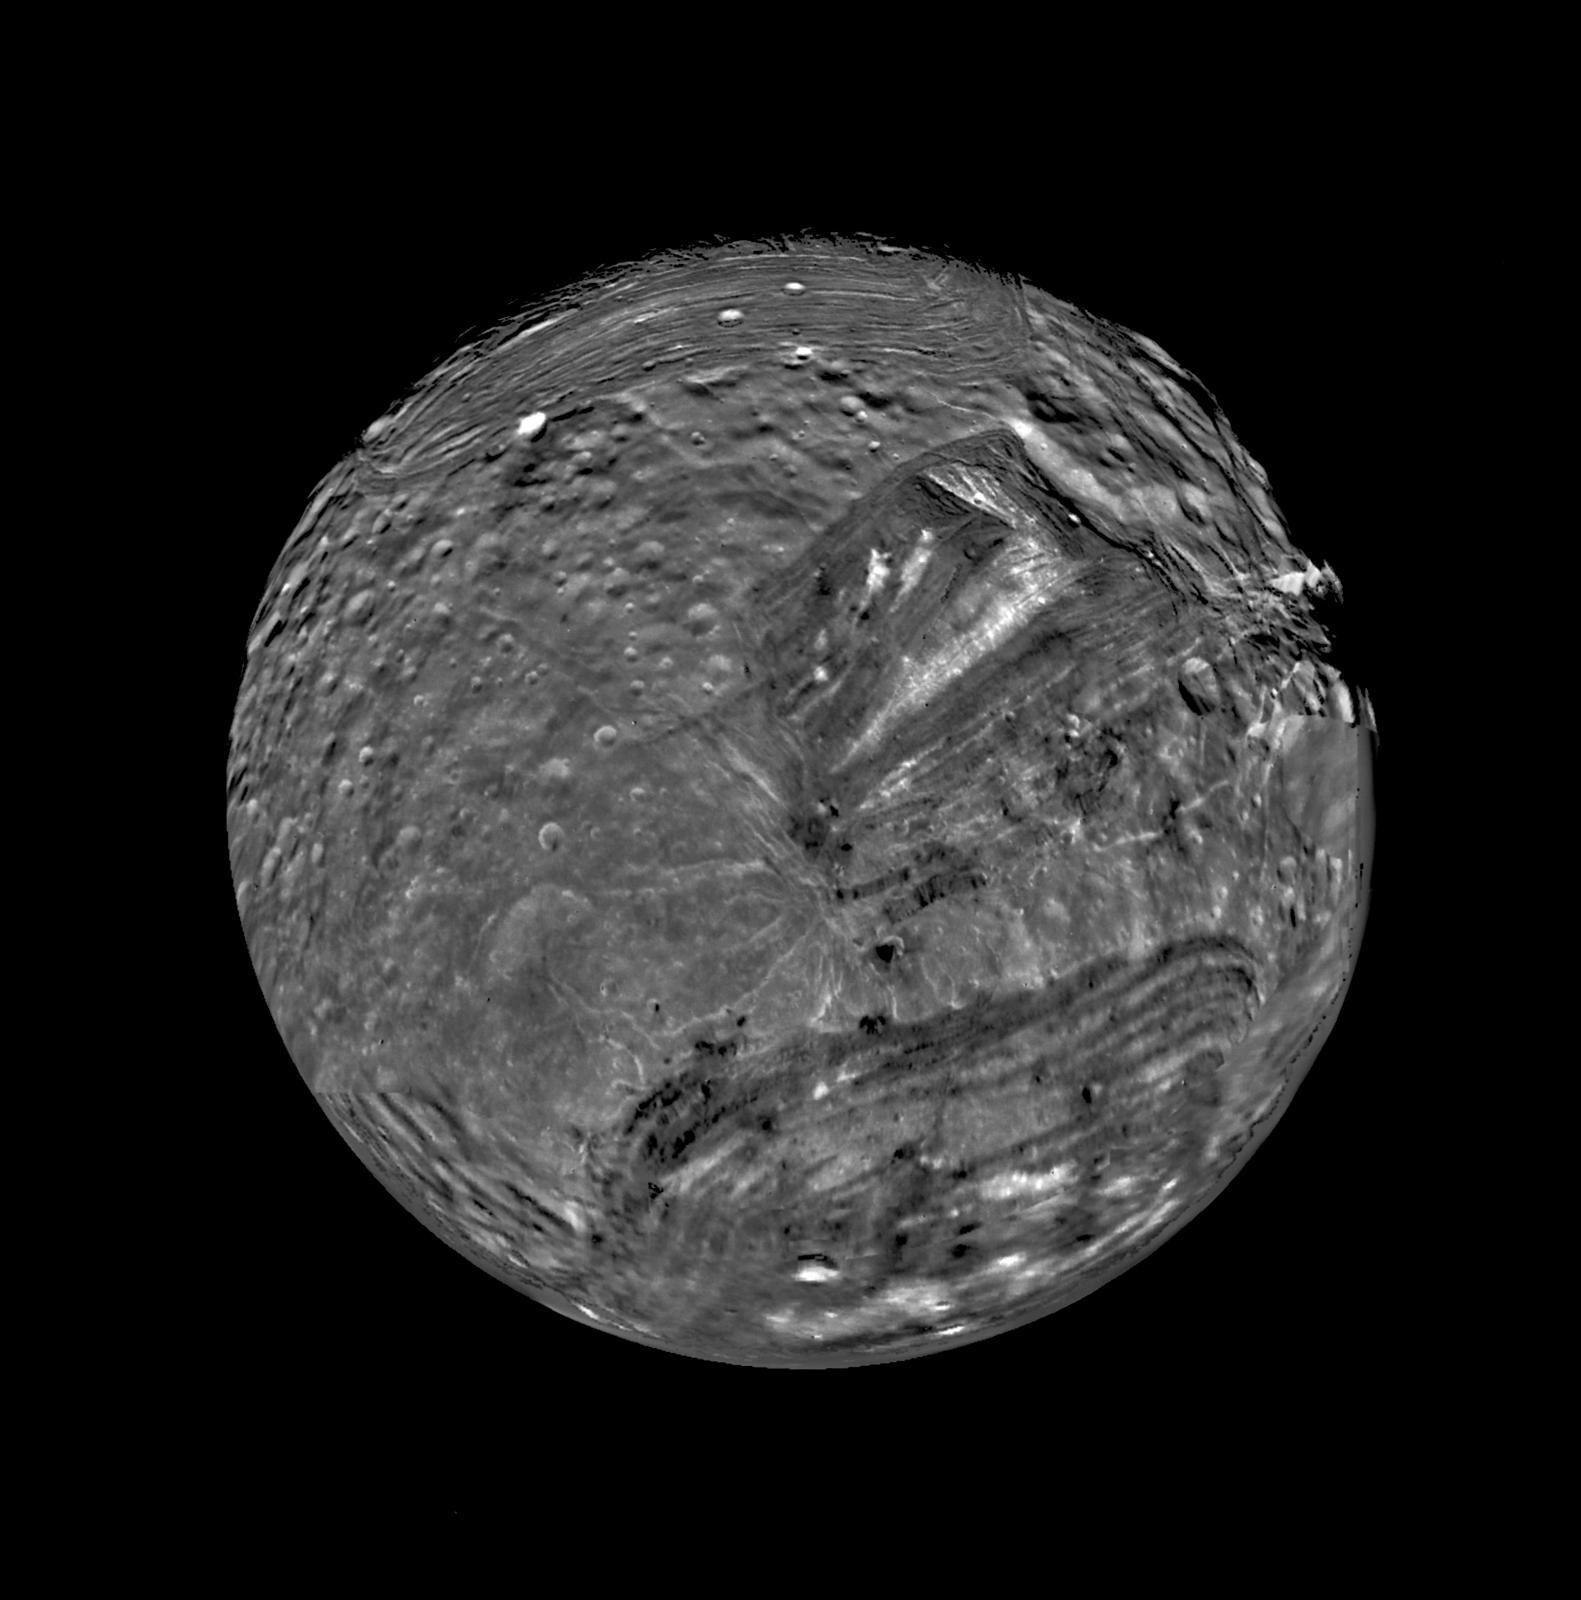 internal uranus moon miranda - photo #6